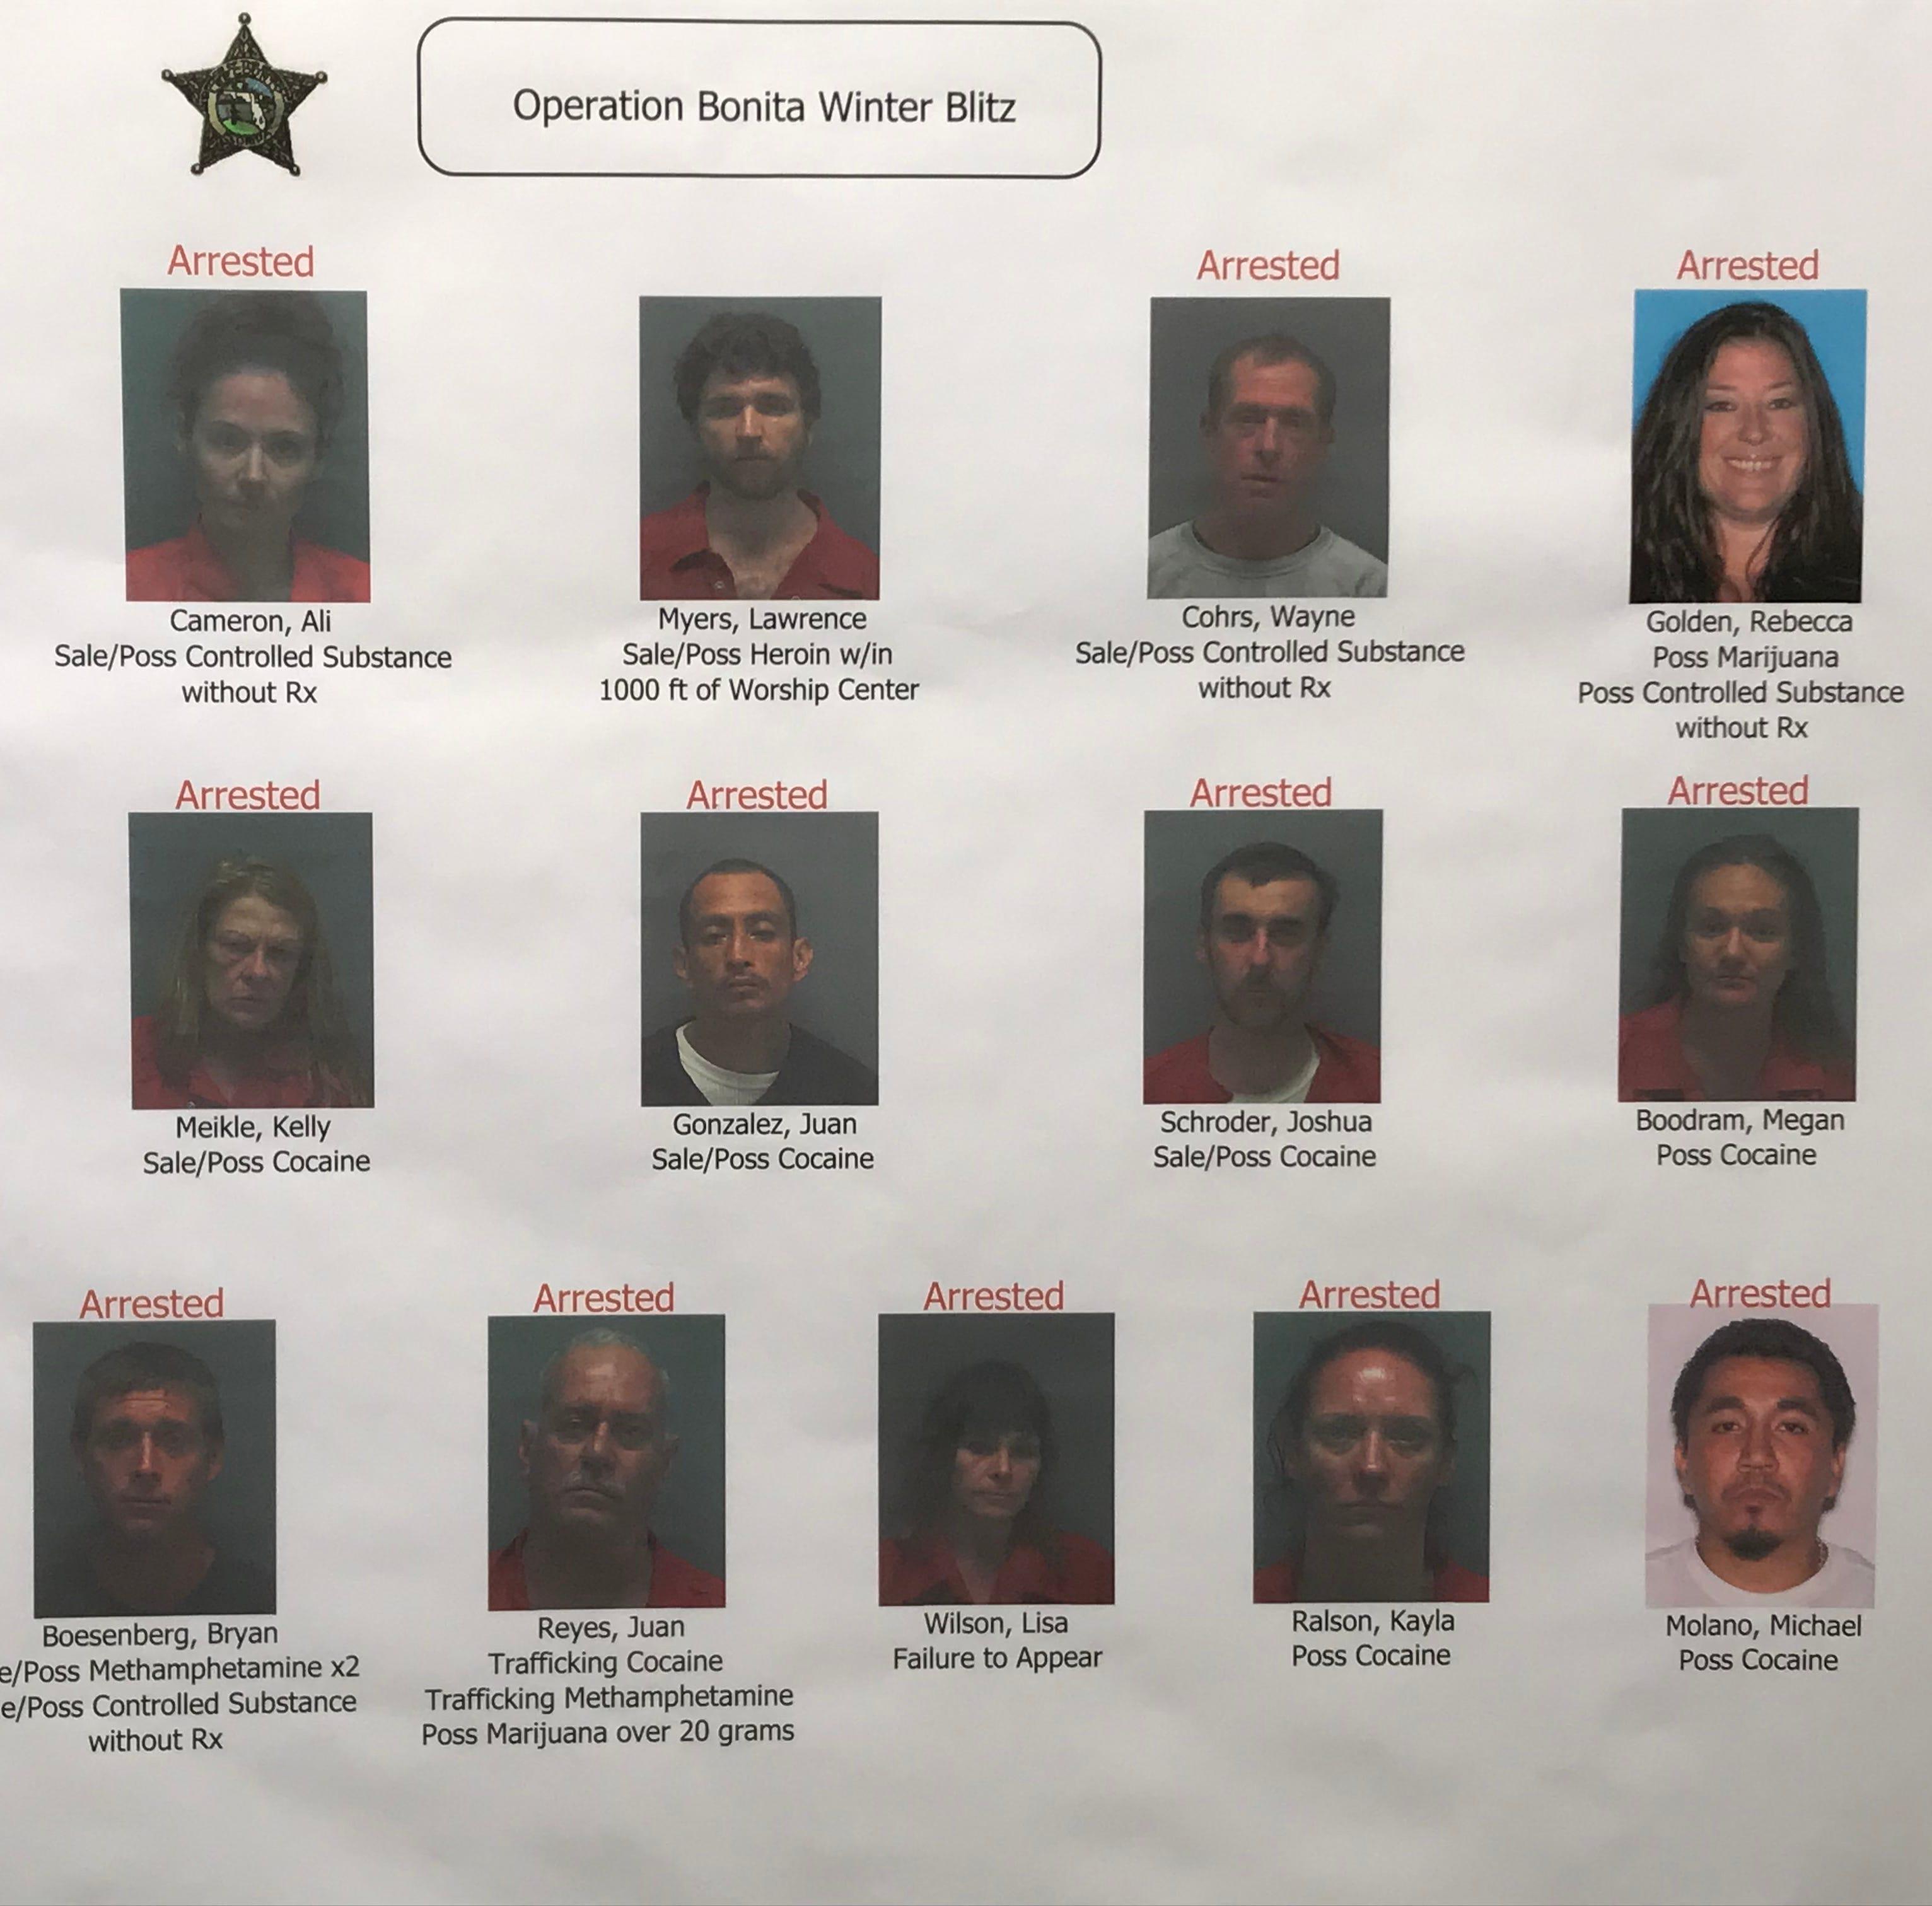 Authorities arrest 15 in operation targeting opioids, other drugs in Bonita Springs